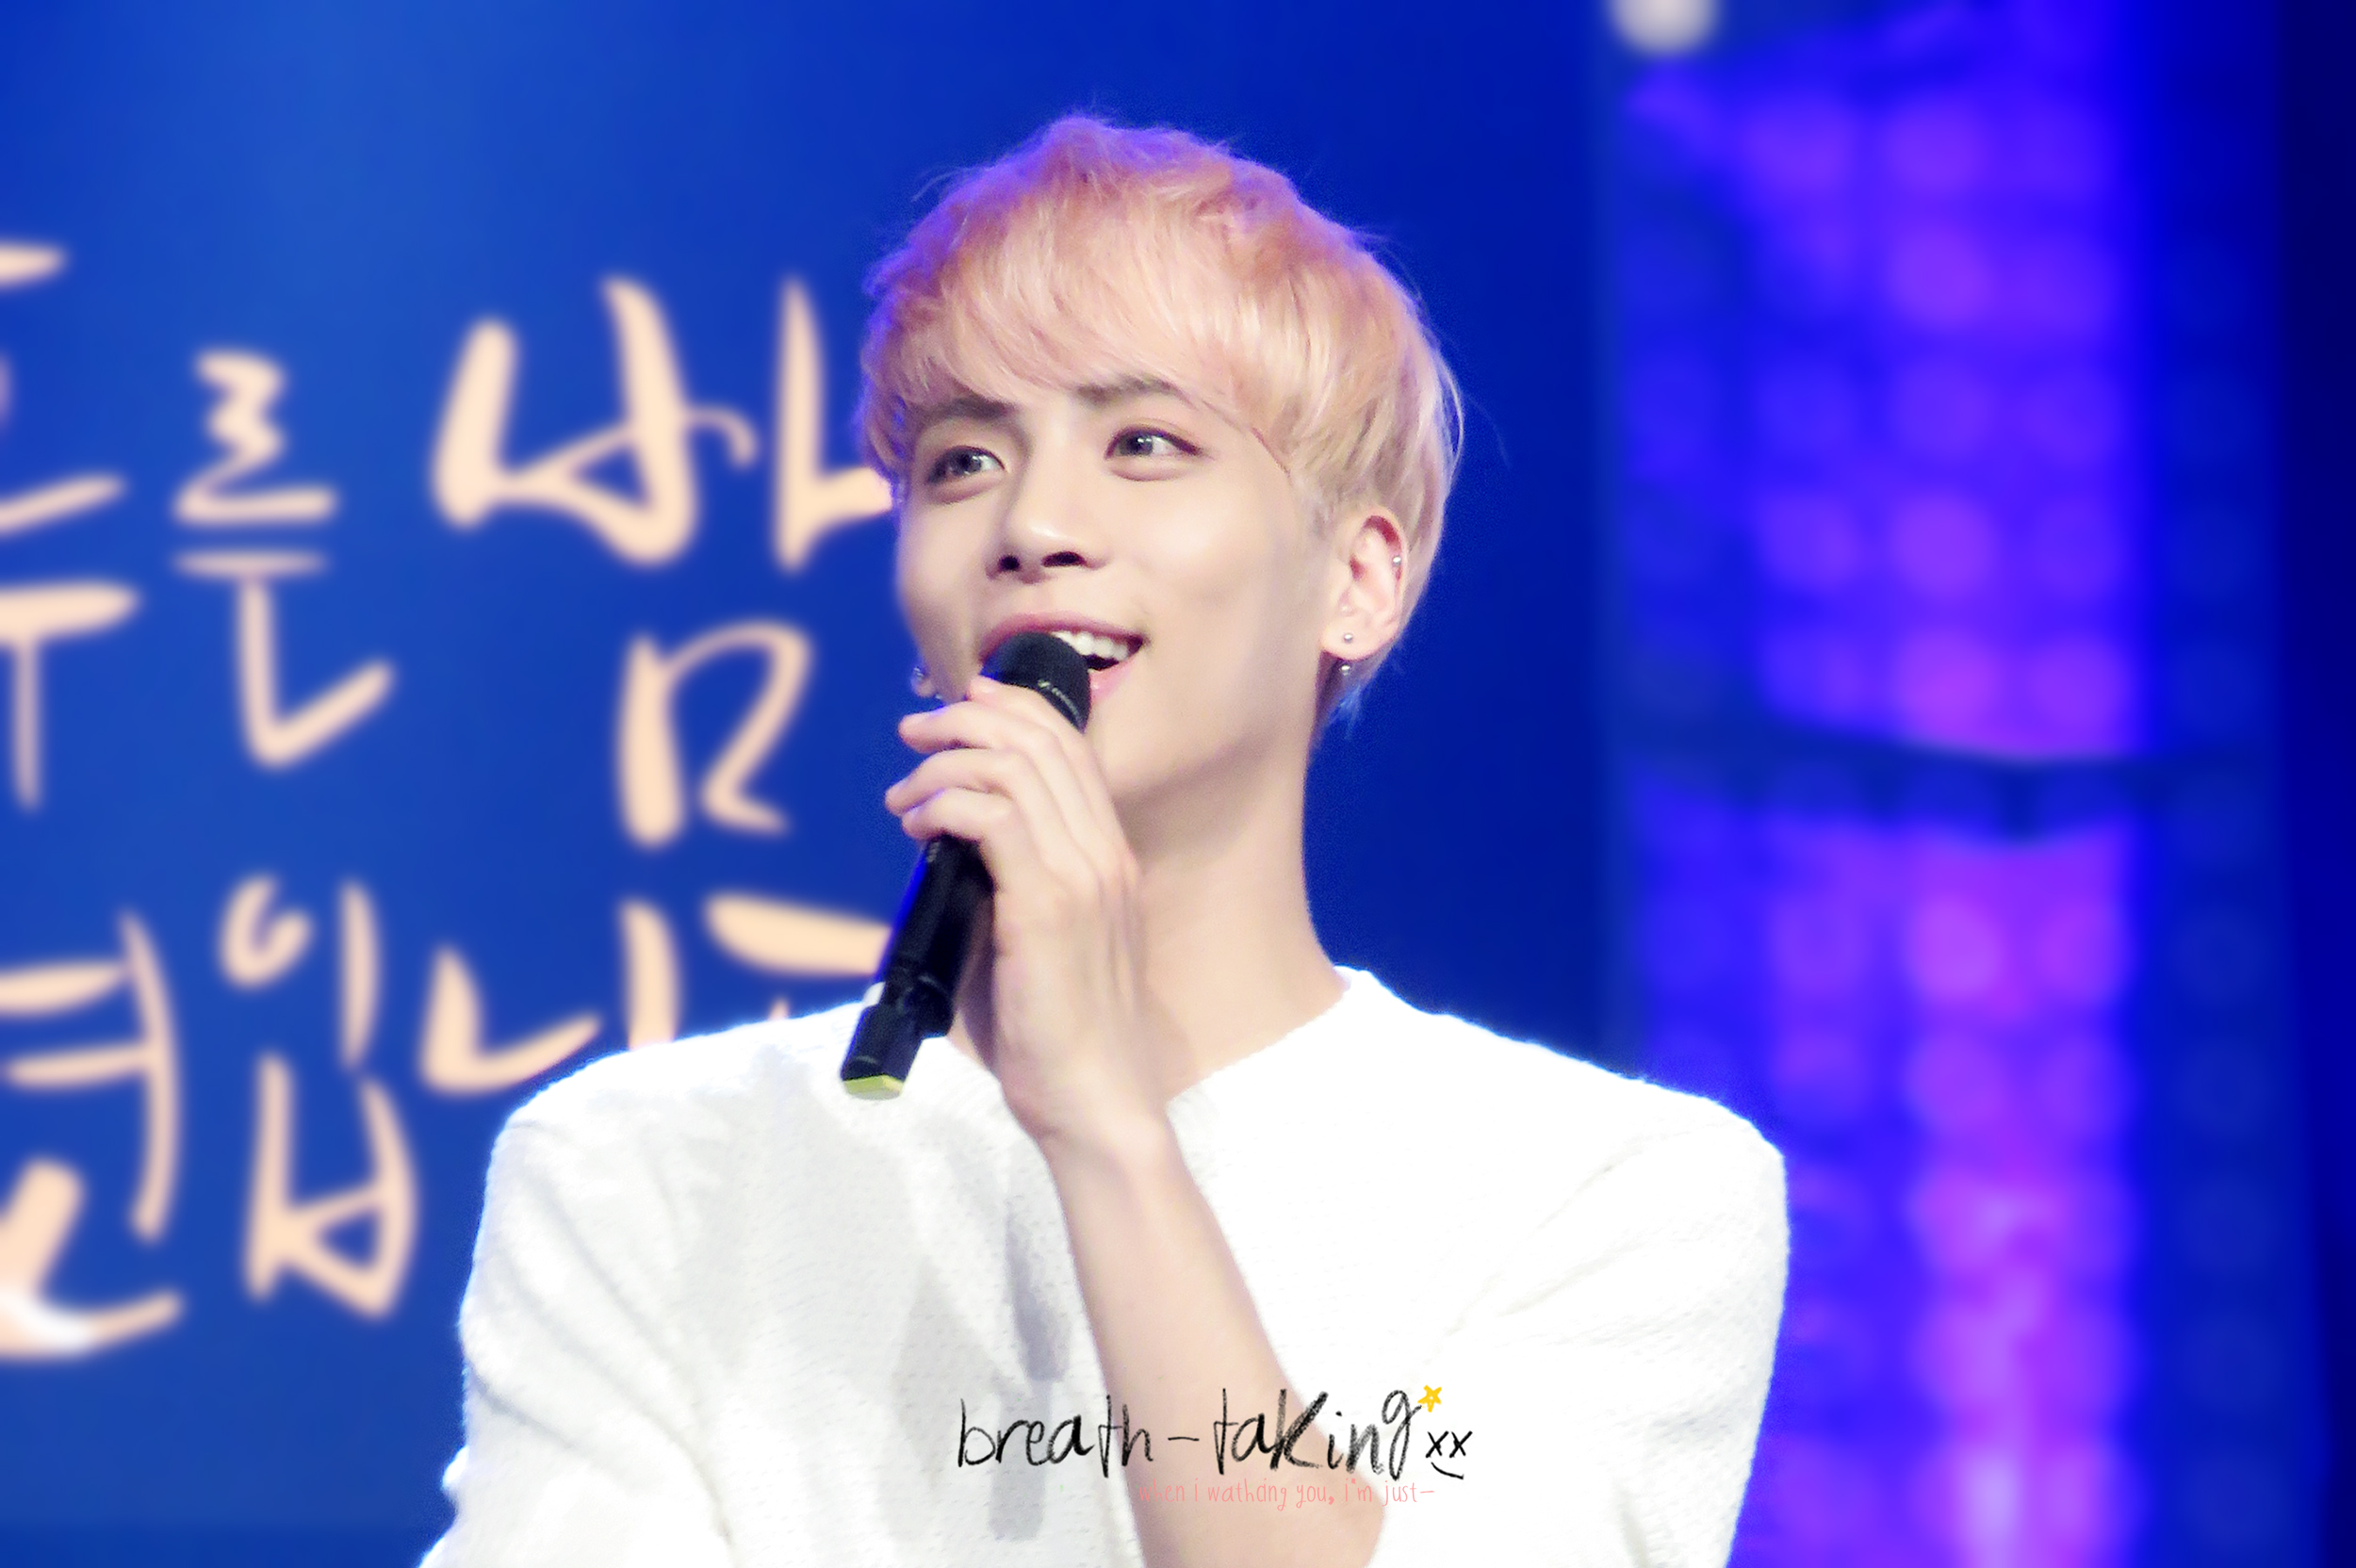 160426 Jonghyun @ MBC Live Concert - Blue Night 262A8239571FA3B005C475